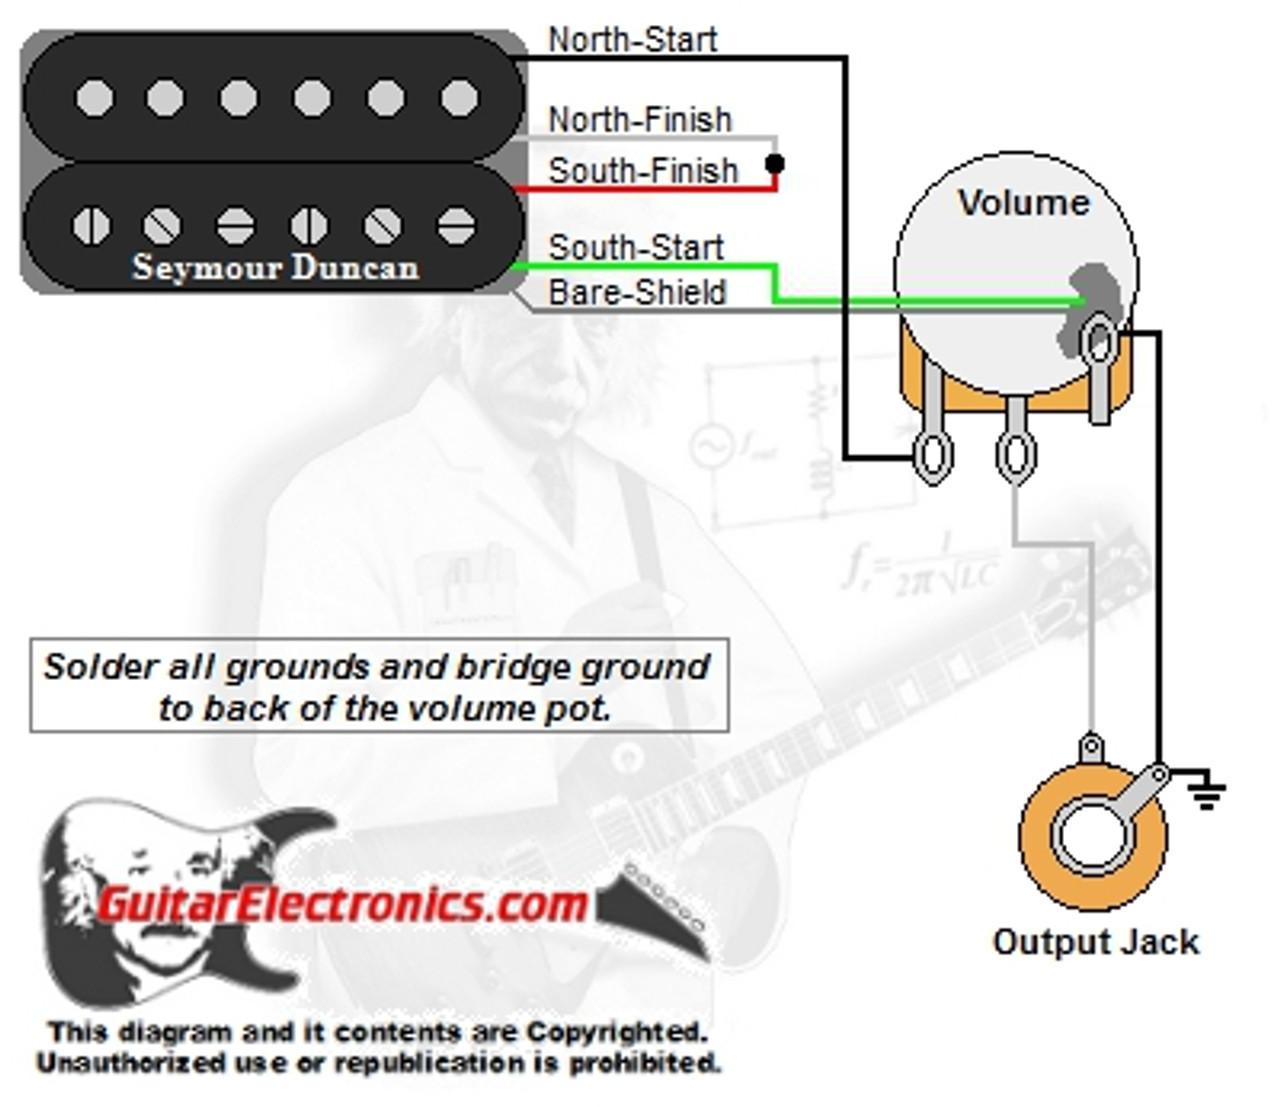 wiring diagrams single humbucker guitar pick up tone volume les paul humbucker wiring diagram single humbucker guitar pick up tone